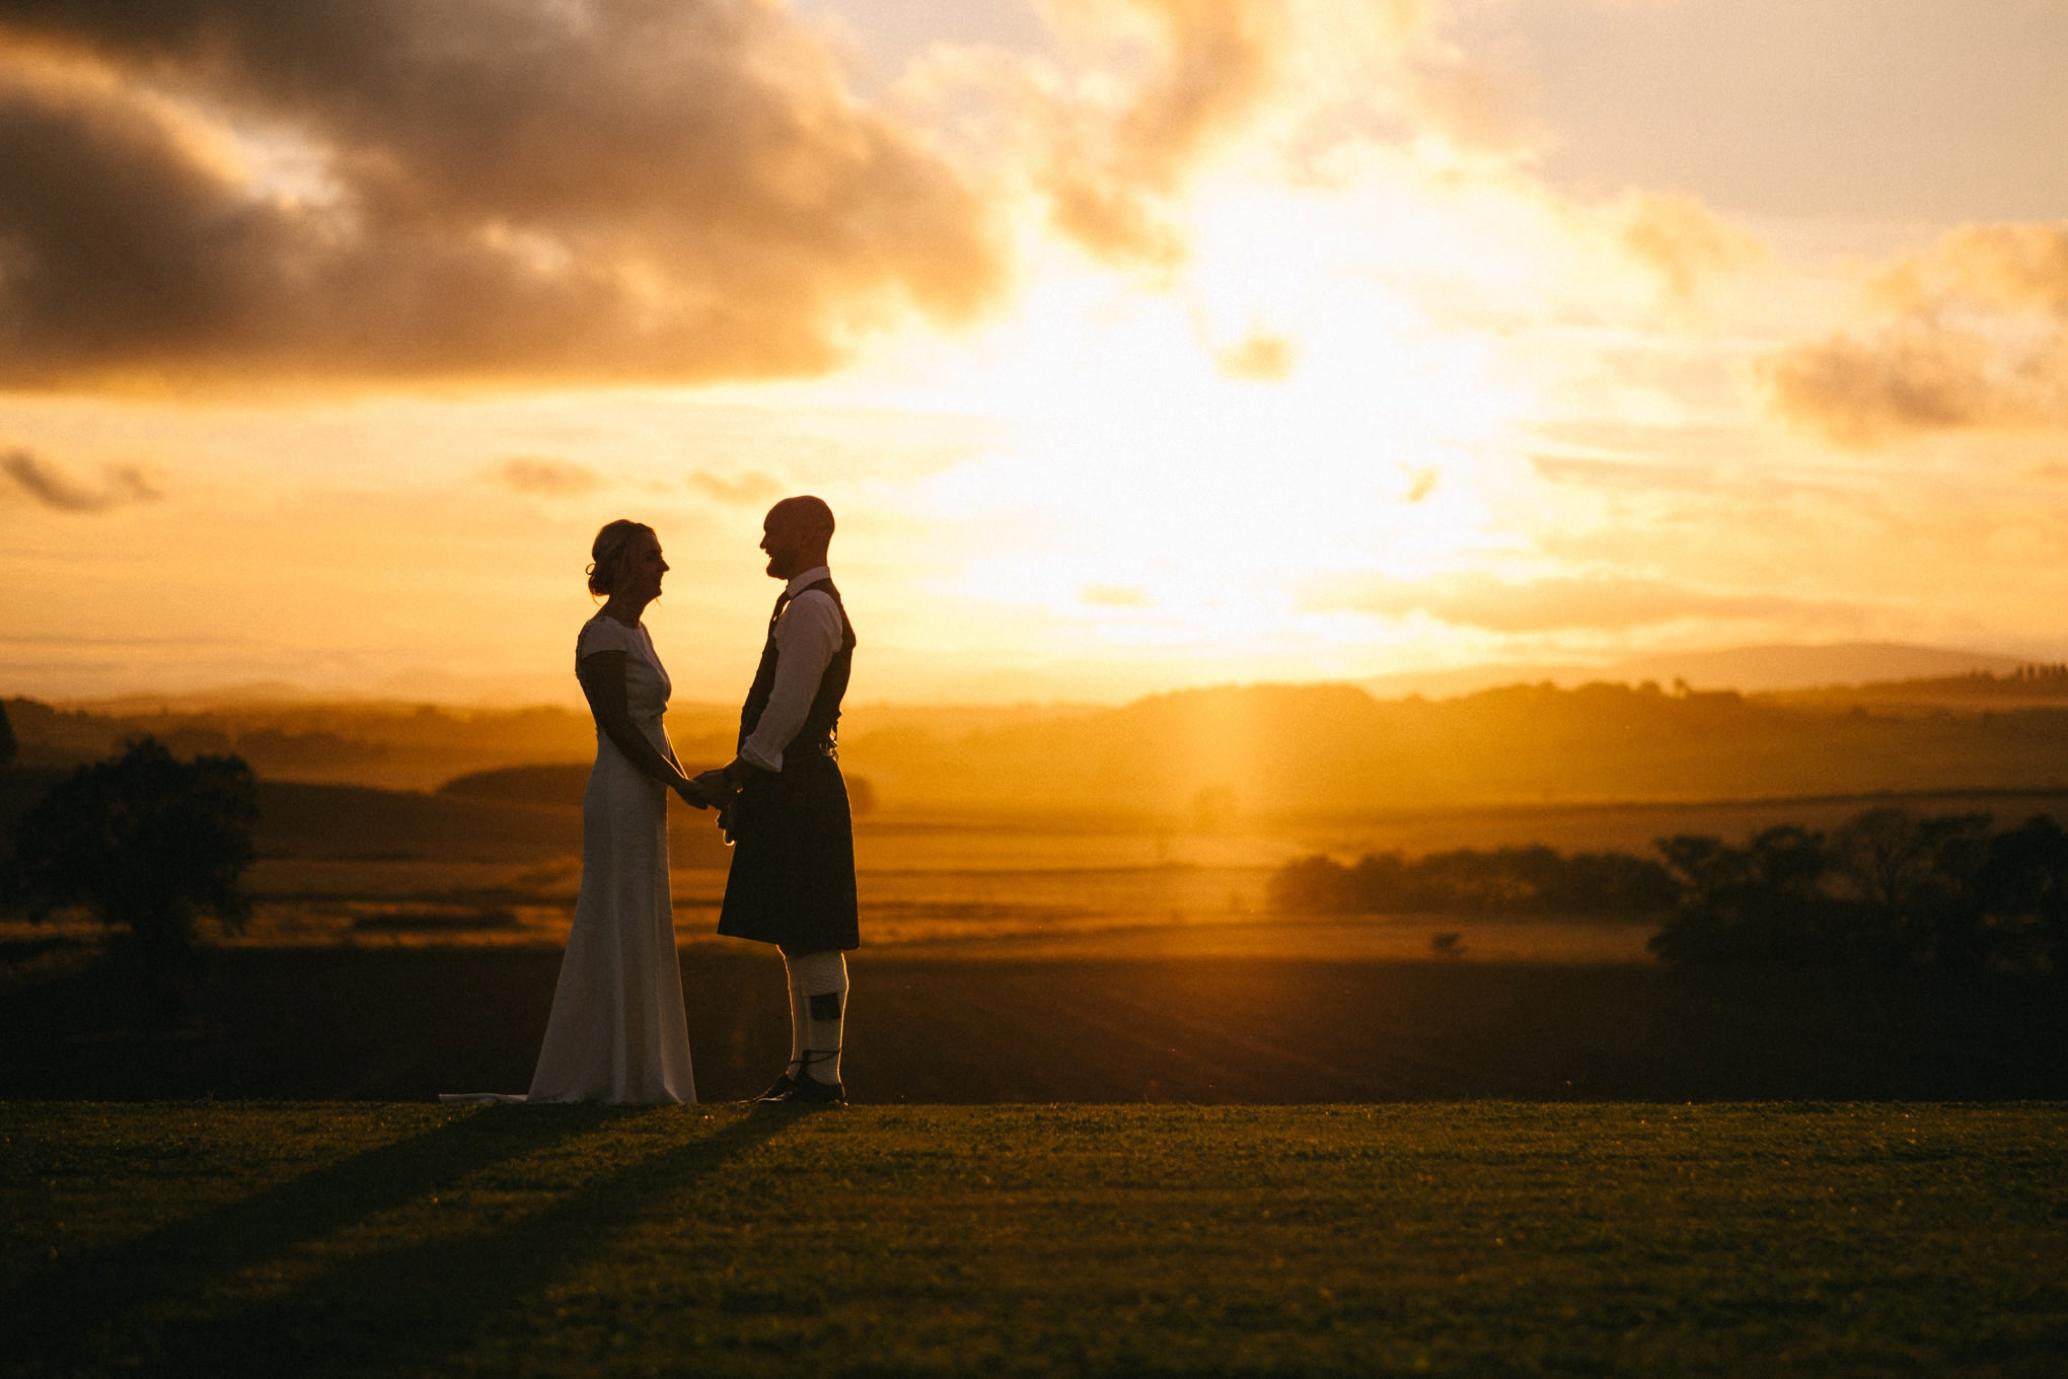 20170826_euan robertson weddings_081_WEB.jpg